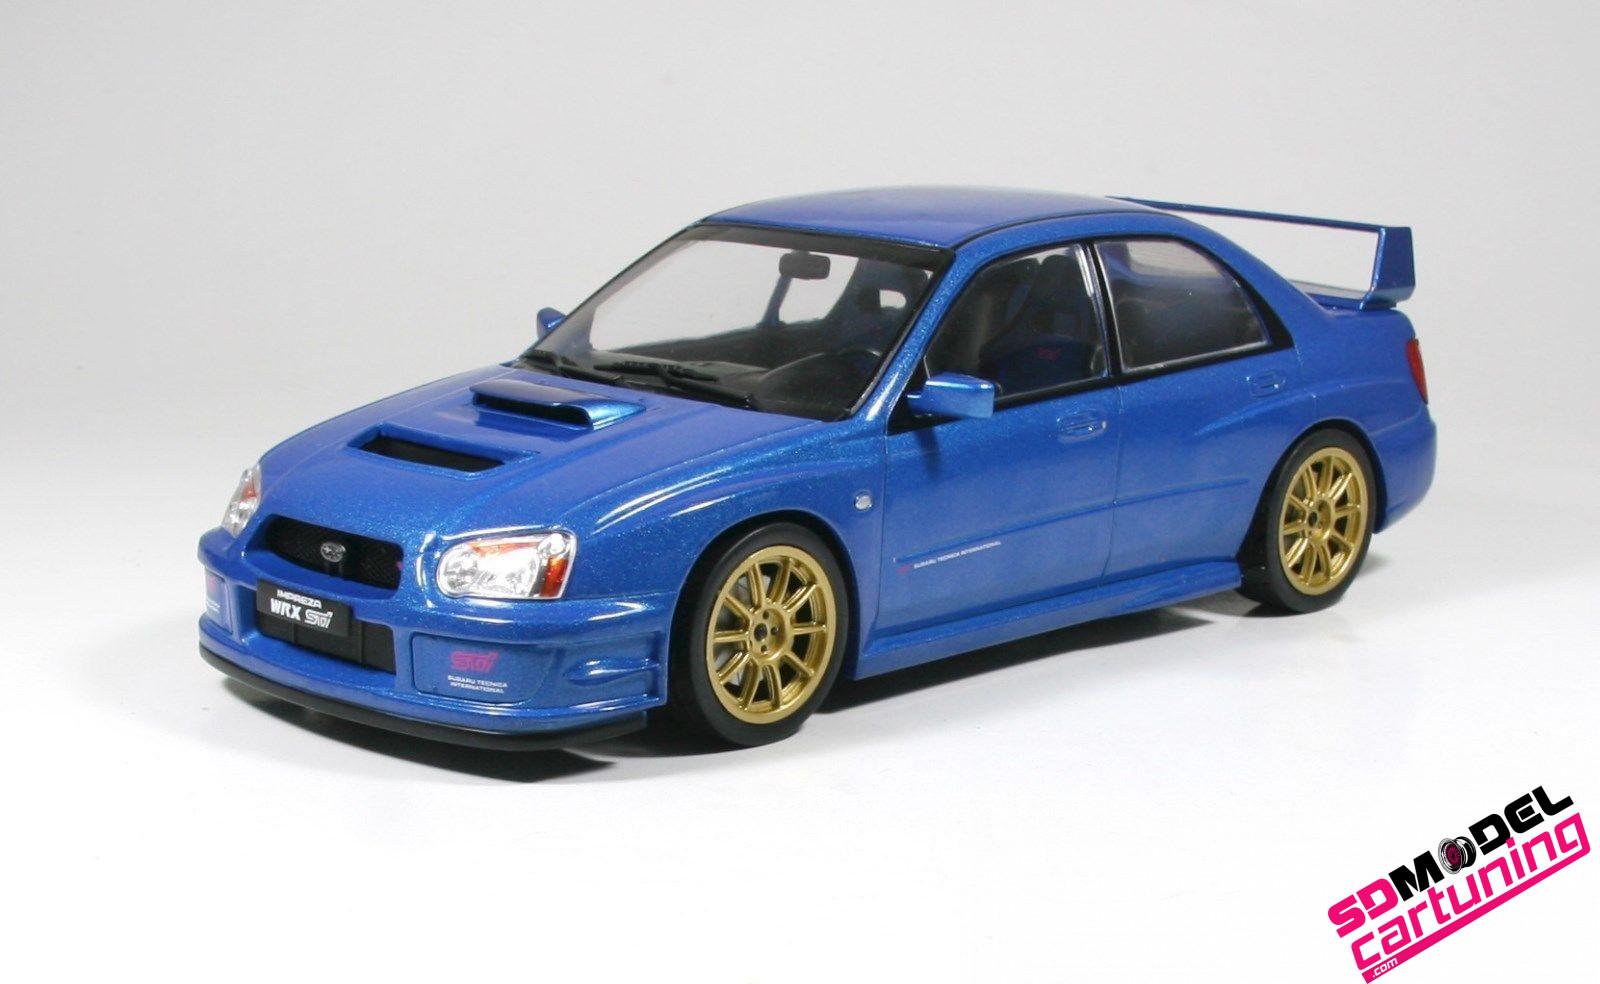 1:18 Subaru Impreza WRX STI 2003